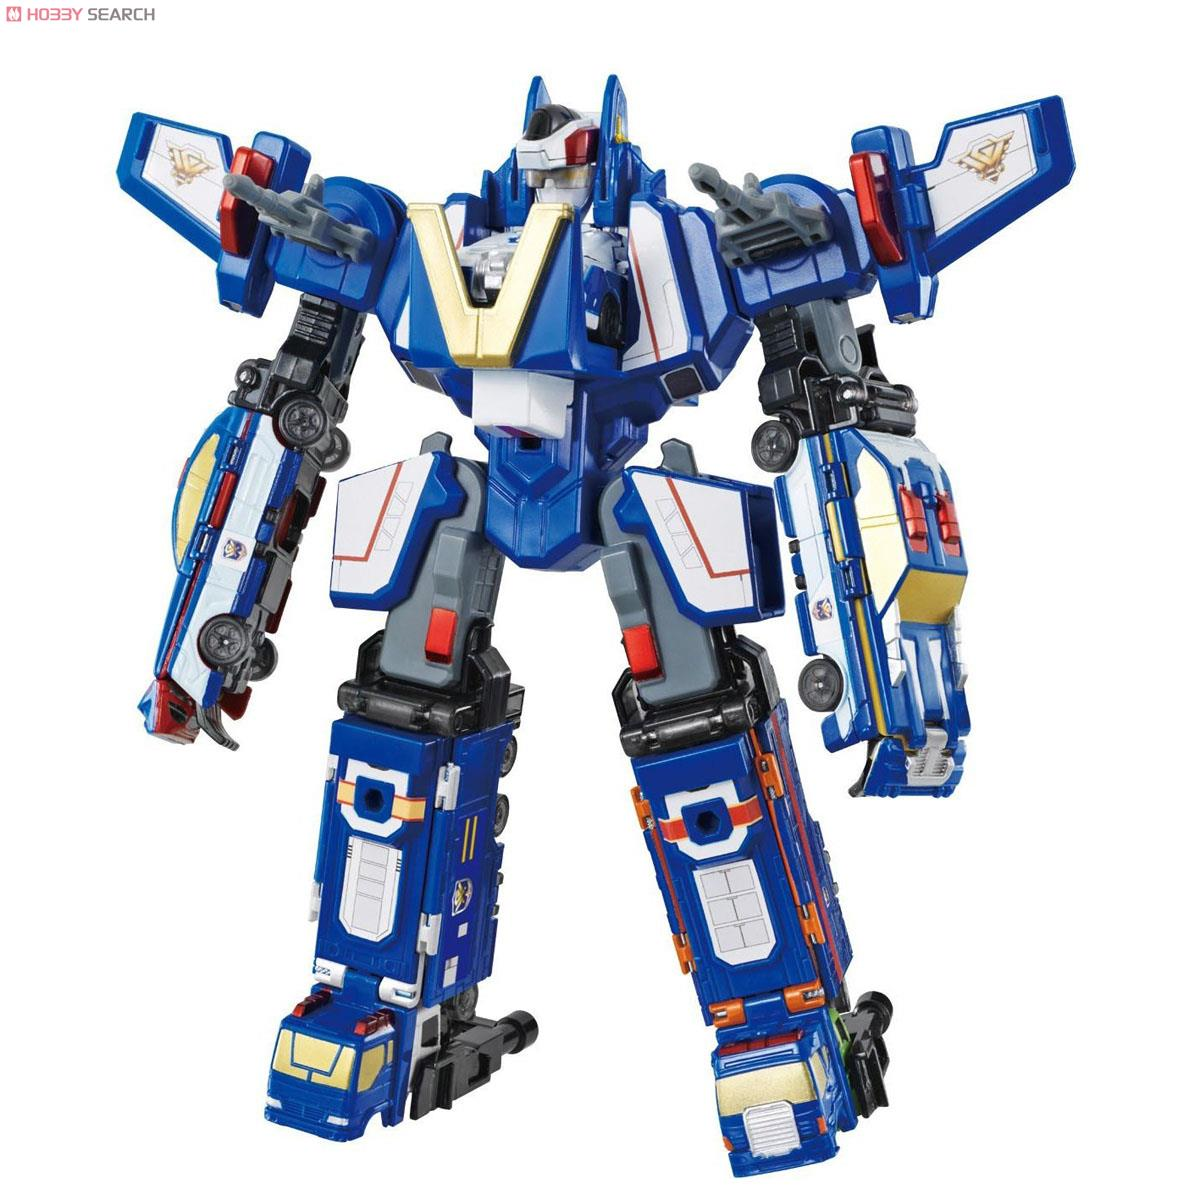 Patrol Gattai ! VooV Guardian Robot ชุดหุ่น Guardian รวมเซท